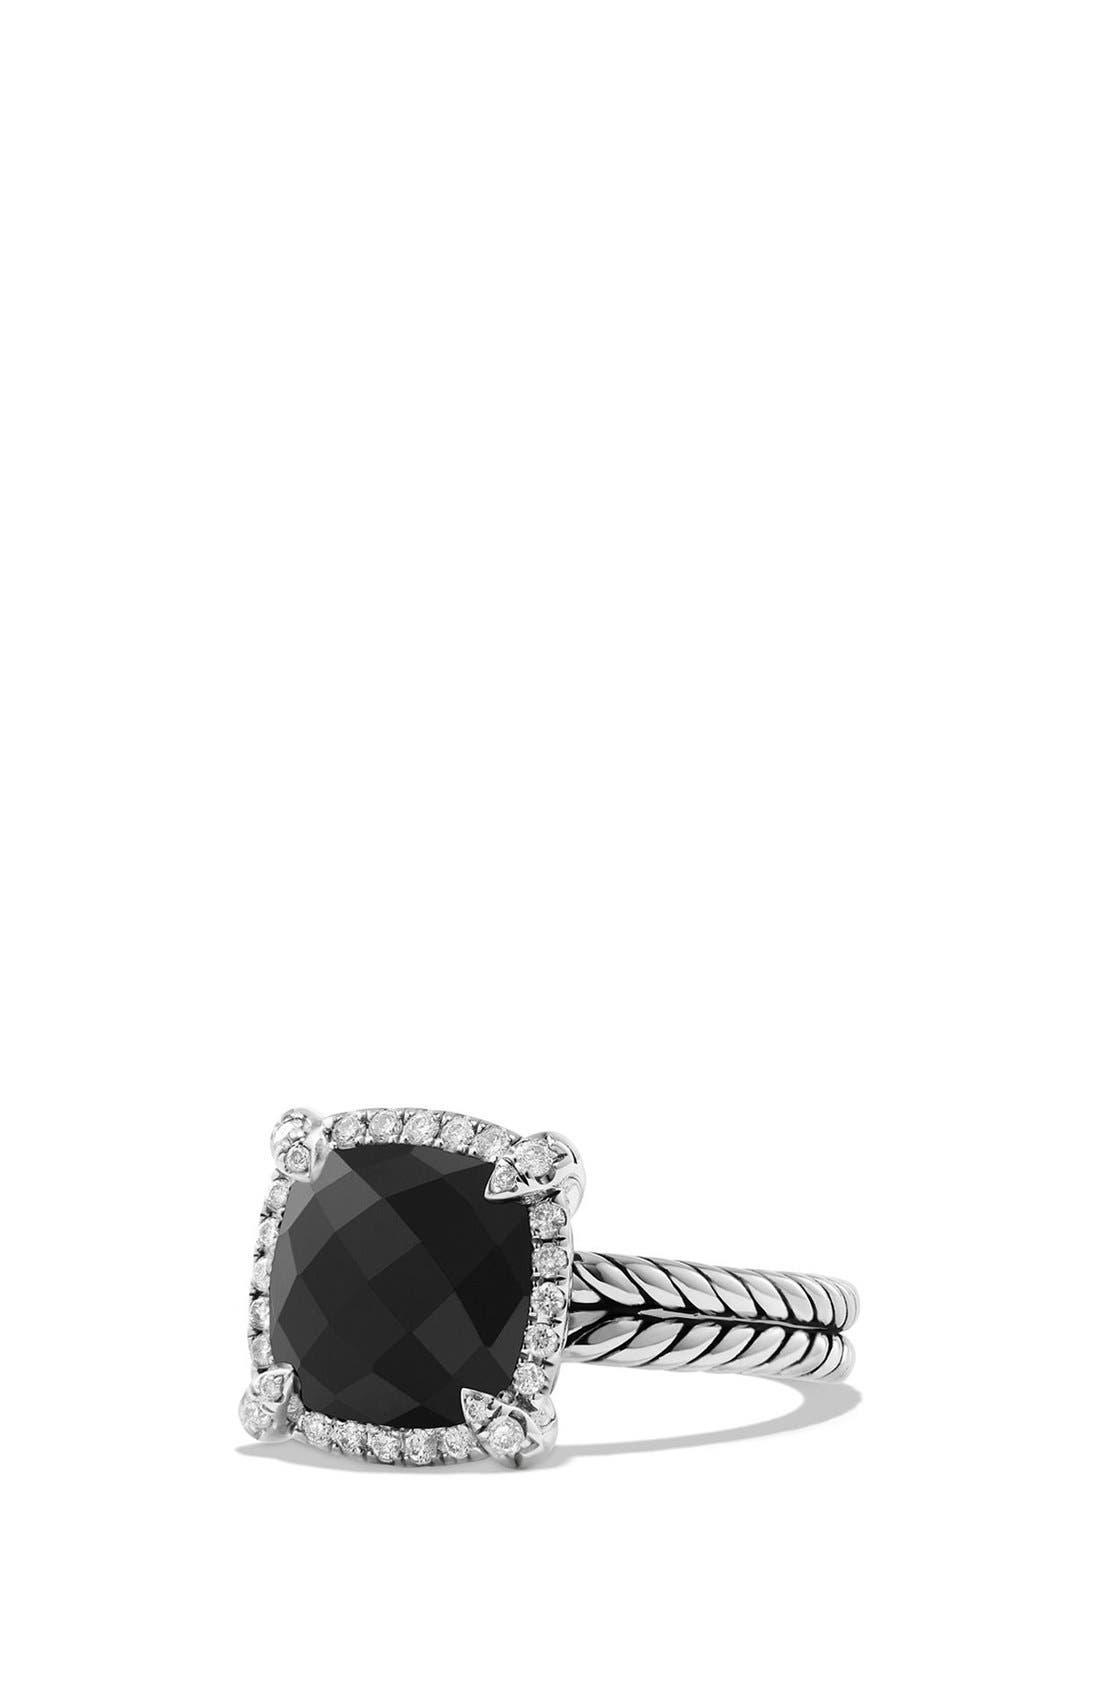 DAVID YURMAN 'Châtelaine' Small Pavé Bezel Ring with Diamonds, Main, color, BLACK ONYX